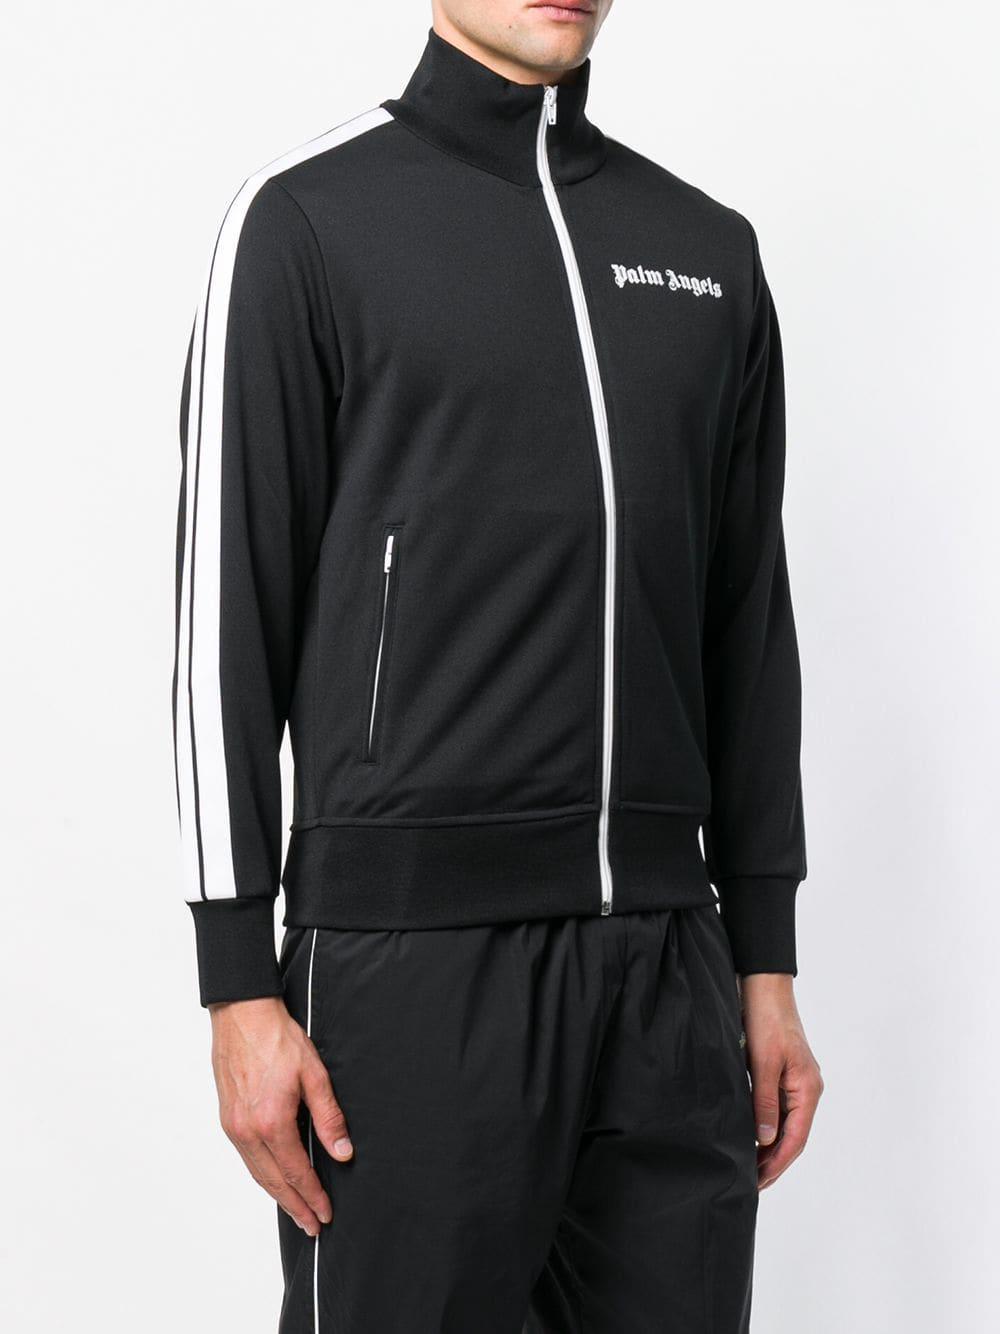 576277e065bd0 Palm Angels - Black Classic Logo Track Jacket for Men - Lyst. View  fullscreen